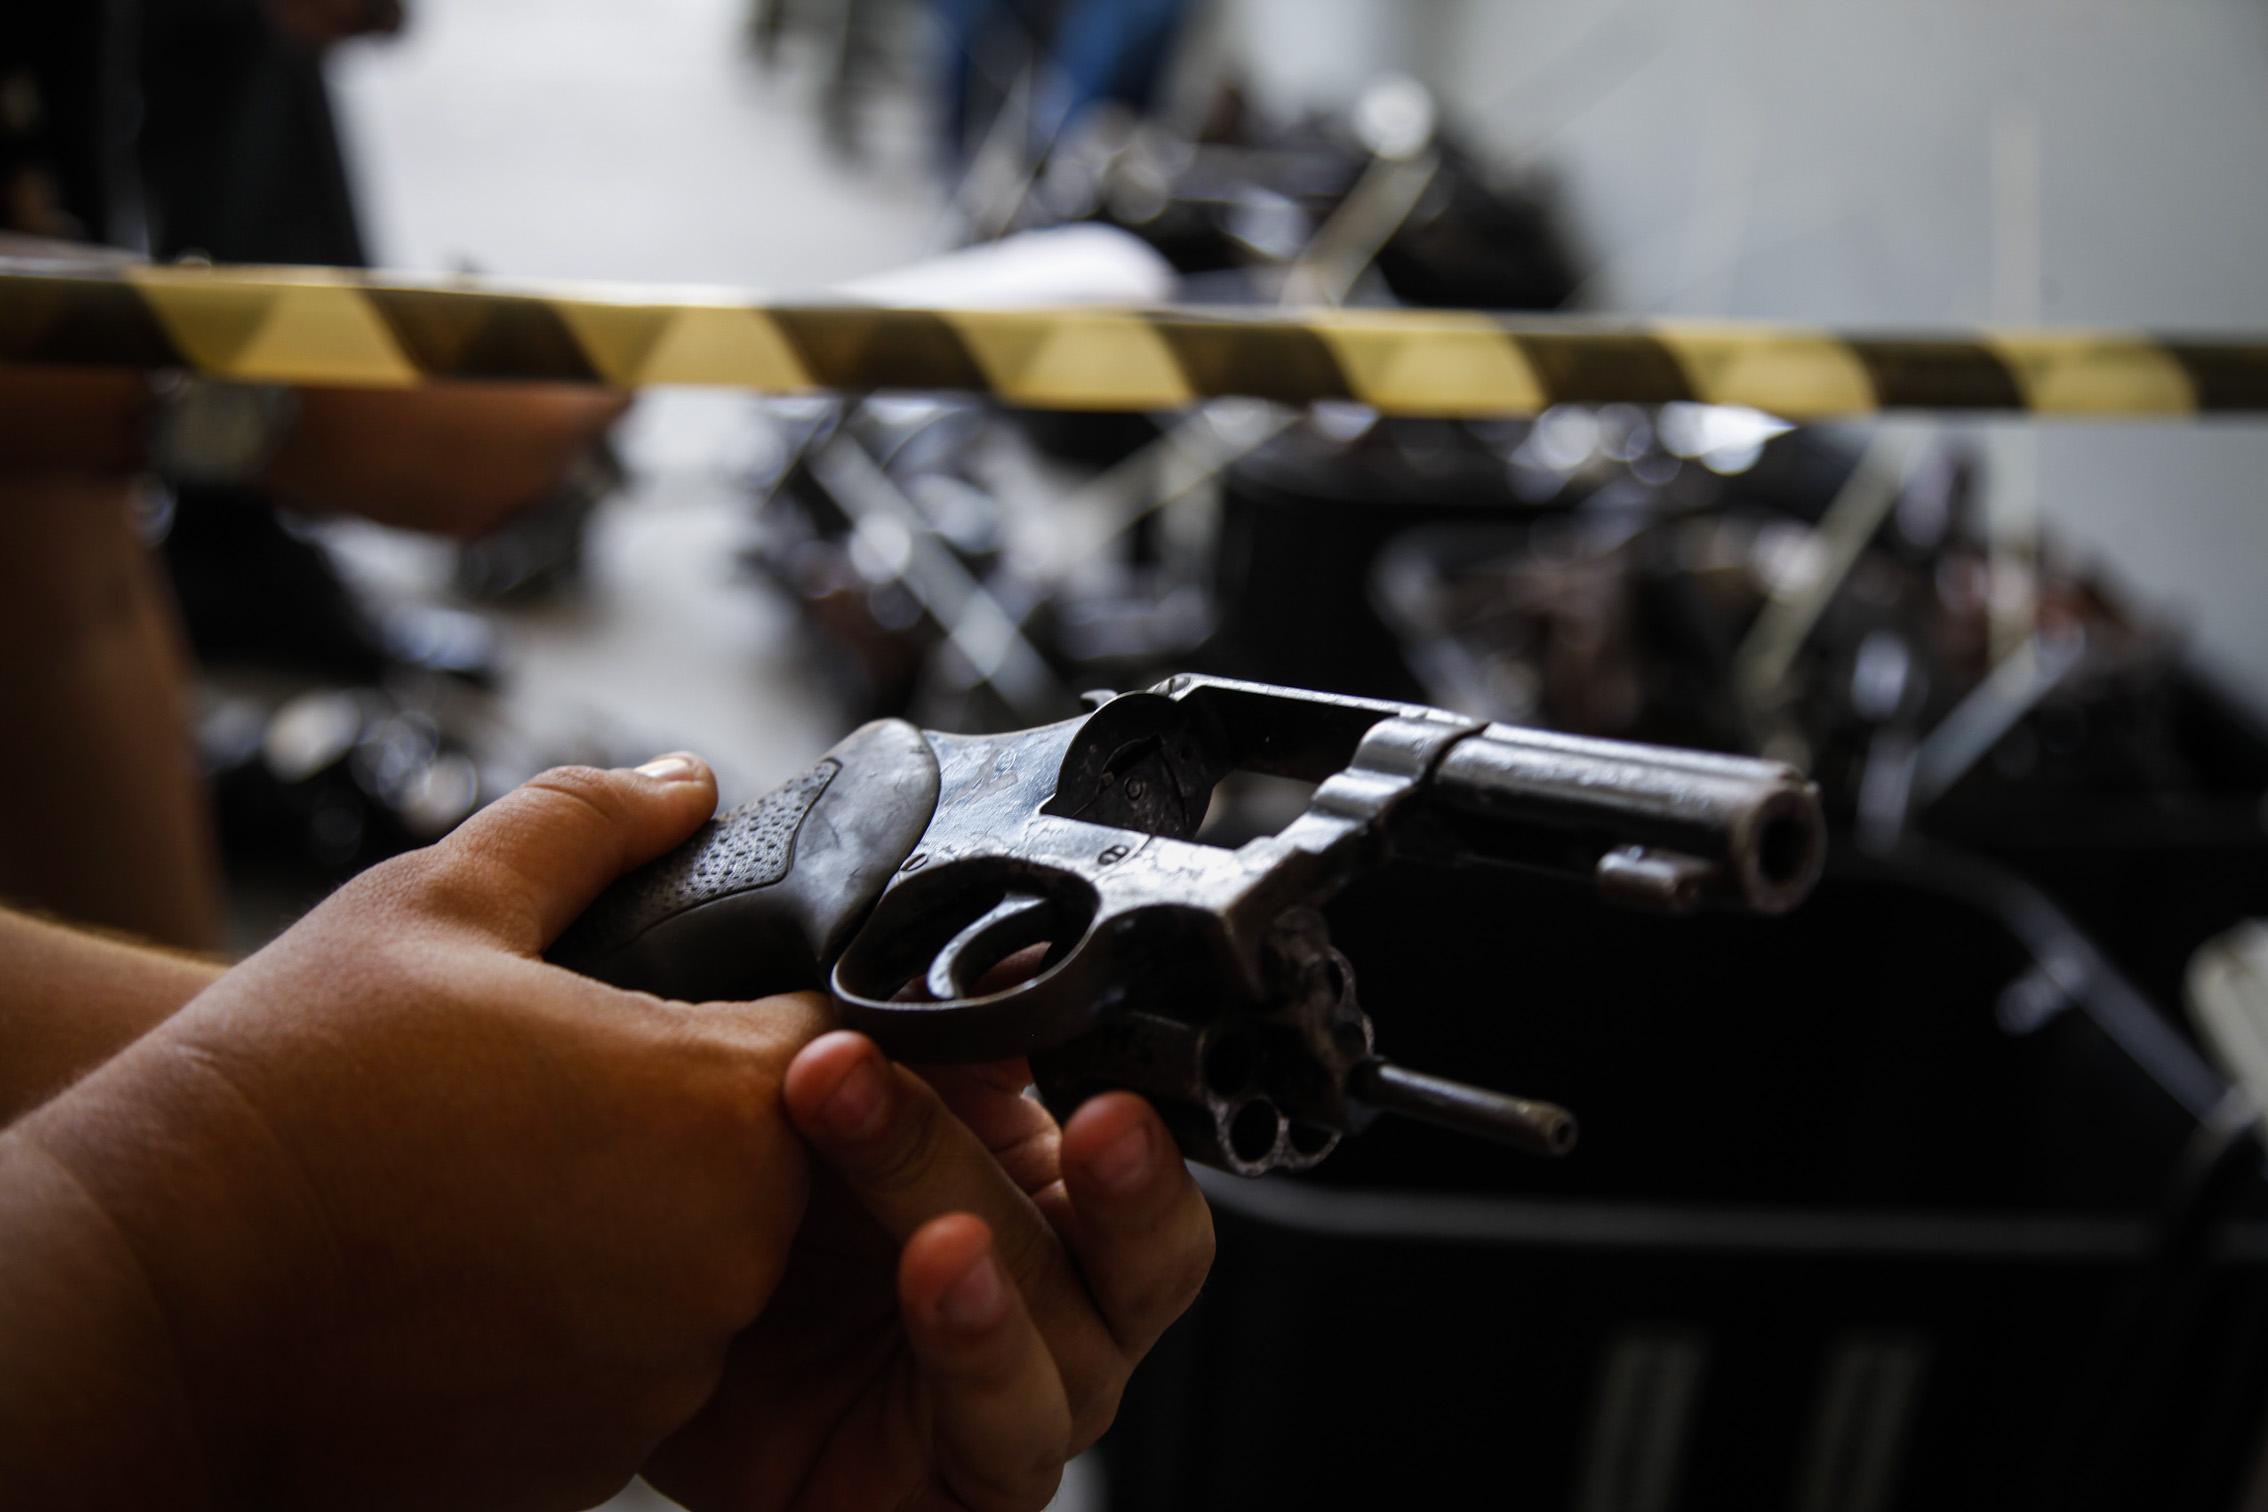 Novo Estatuto autoriza compra de armas de fogo para maiores de 21 anos